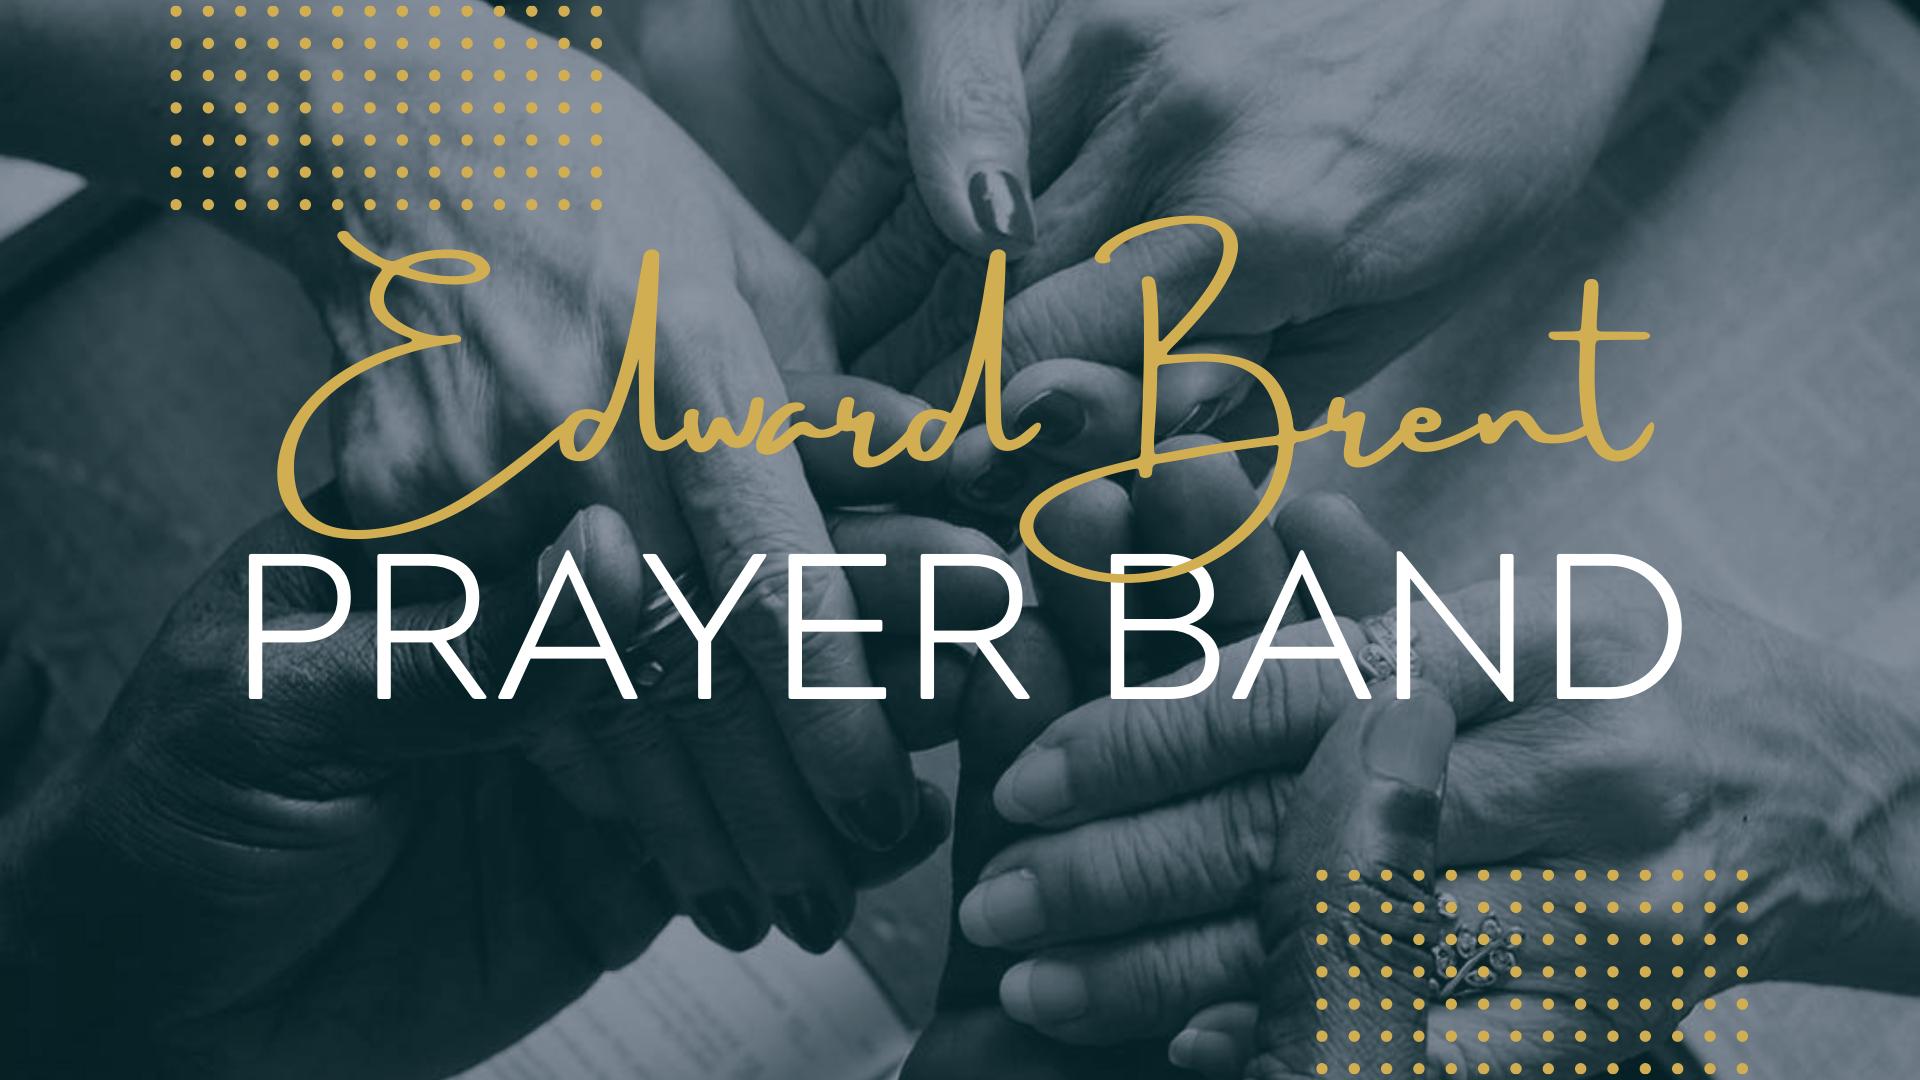 Edward Brent Prayer Band